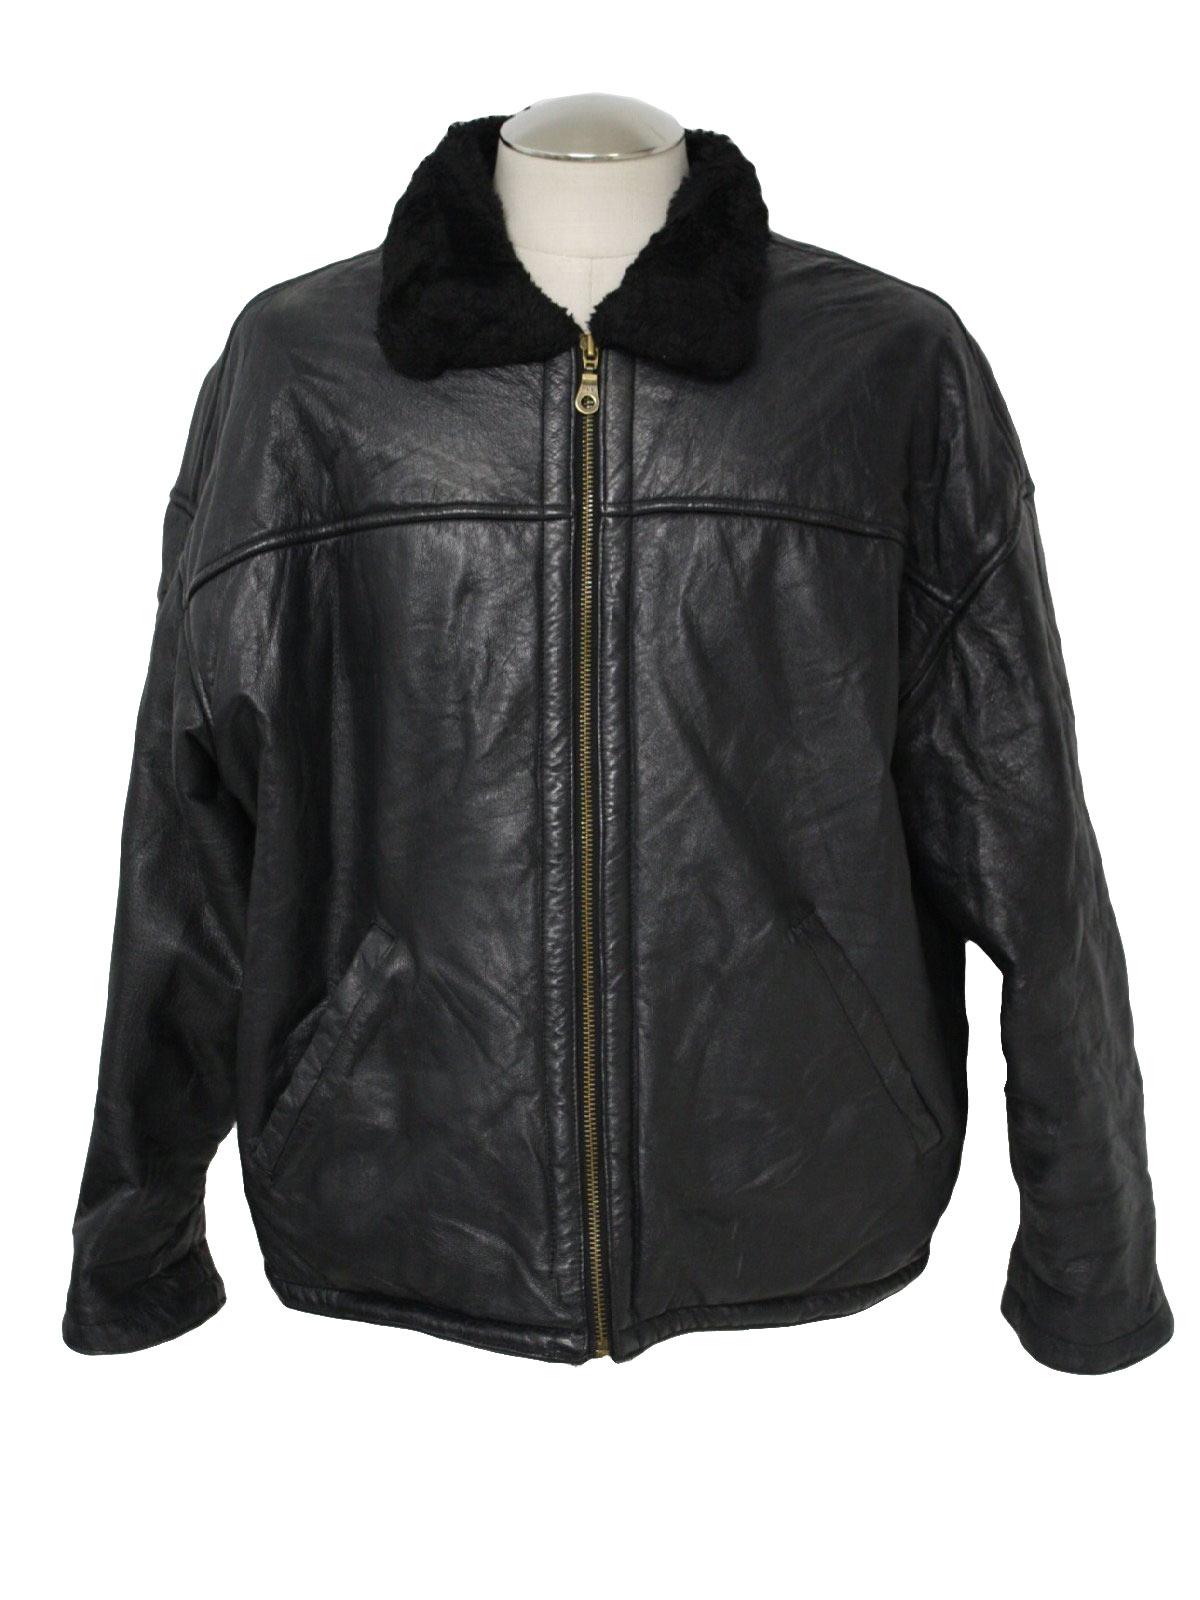 Western style leather stitching furry jacket